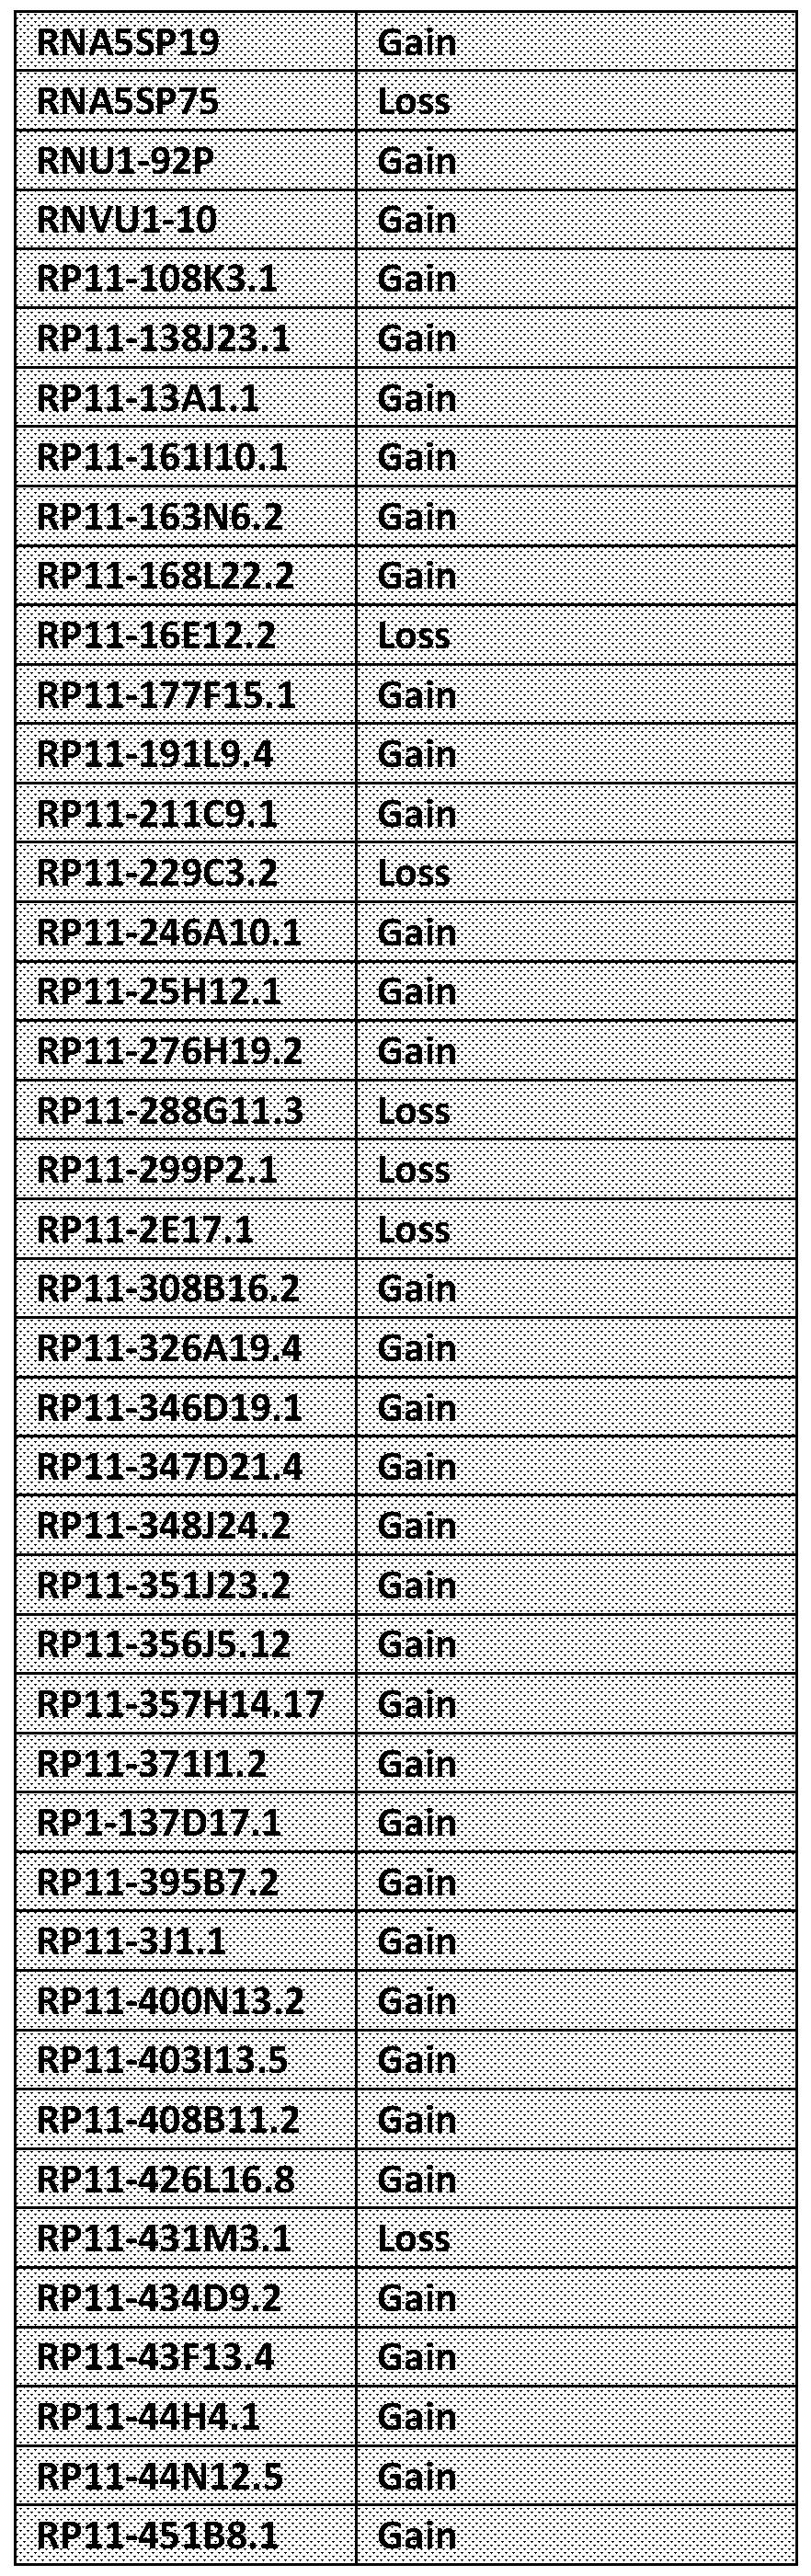 WO2017142484A1 - Epigenomic profiling reveals the somatic promoter